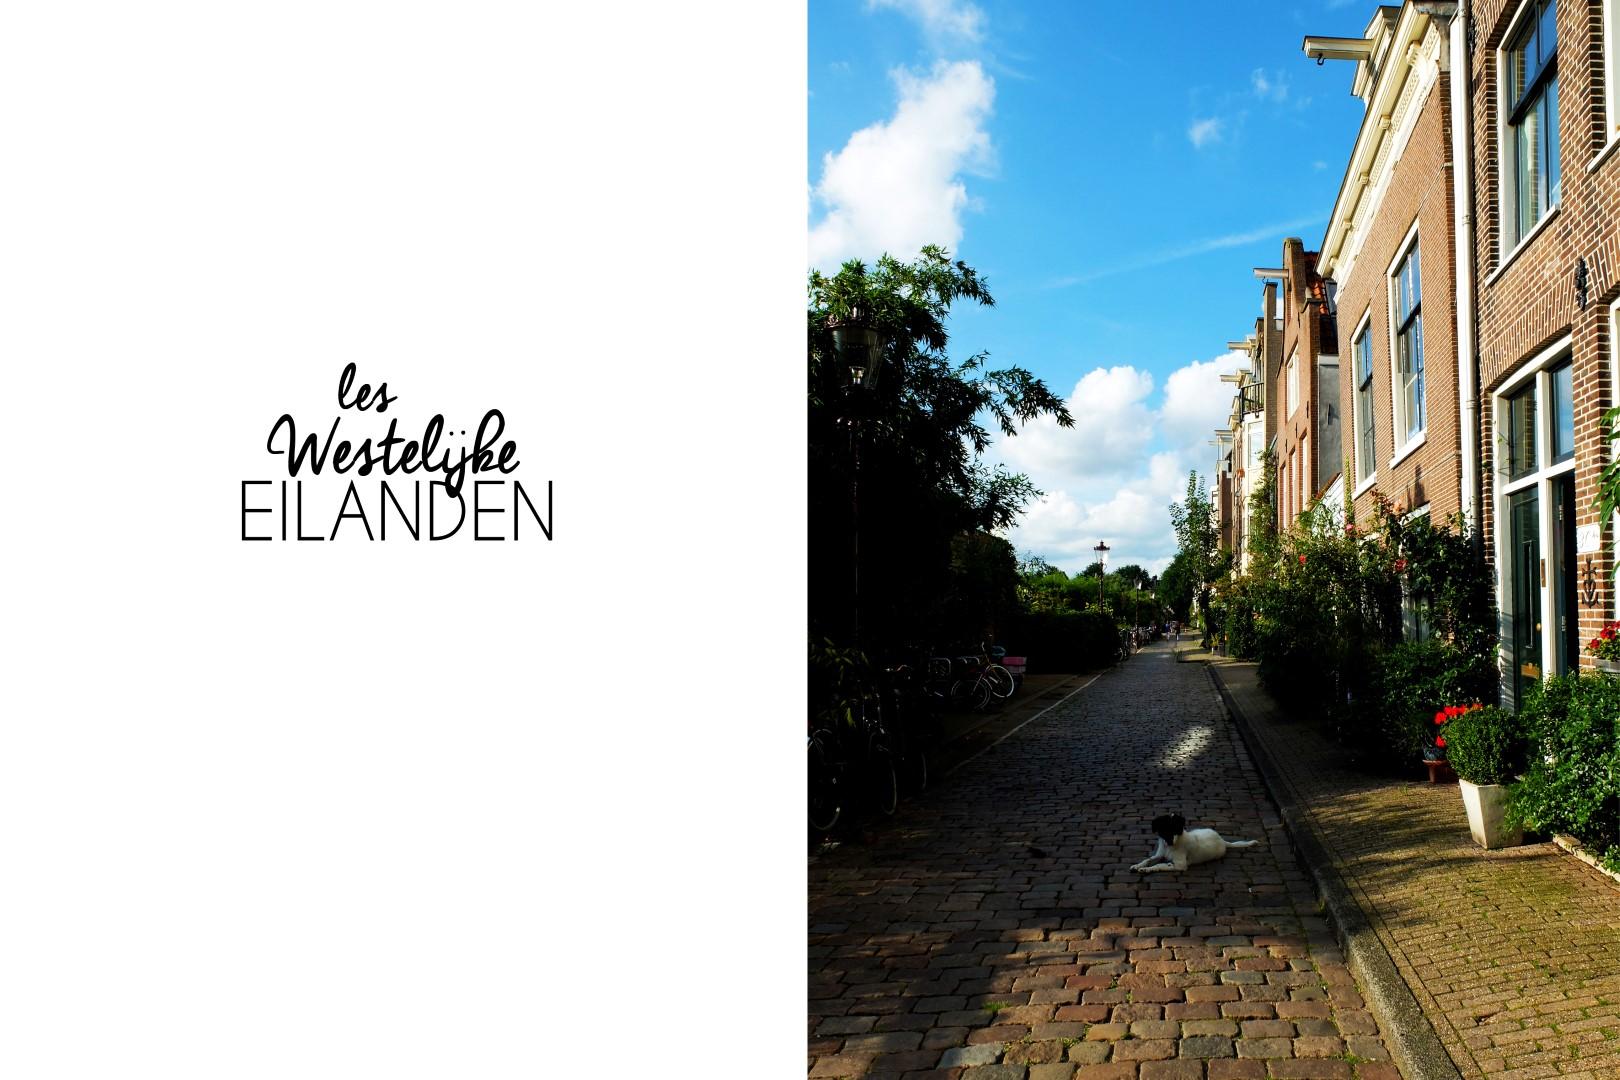 20160210_westilijke_eilanden (Large)